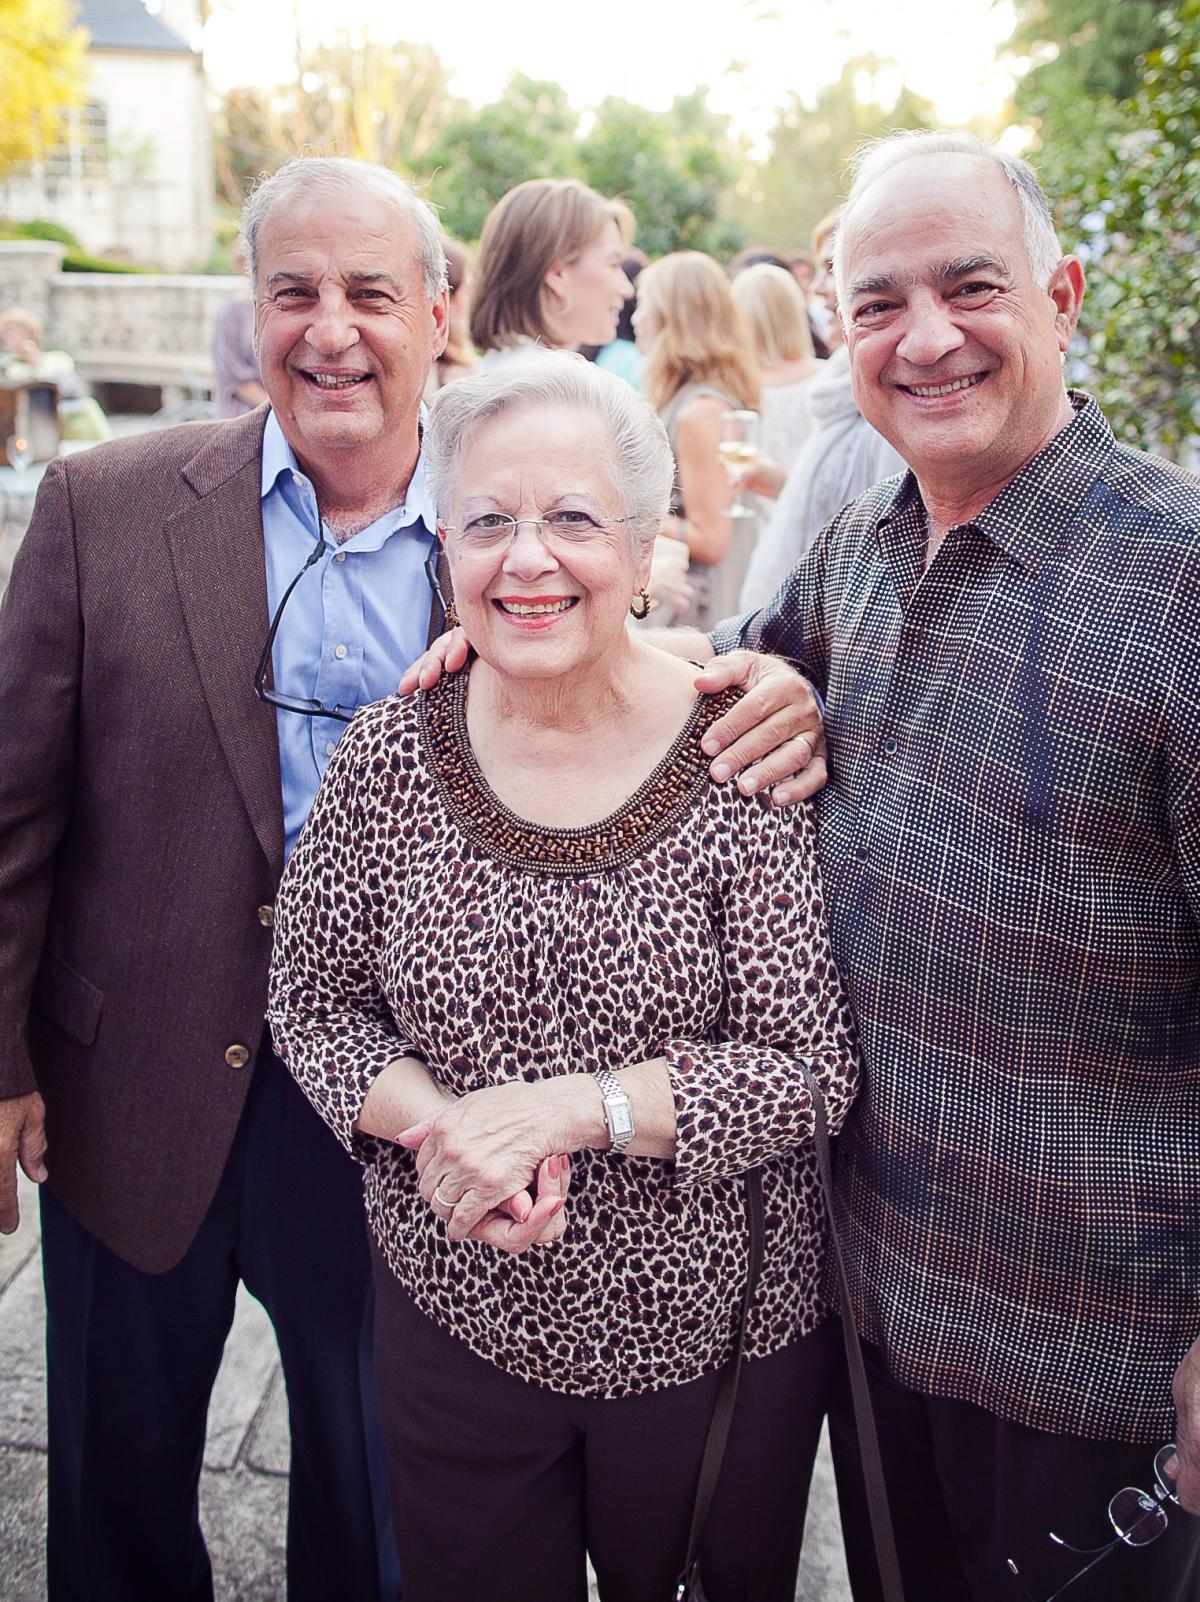 Houston, Robert Draper book signing, September 2015, Luke Mandola, Rose Mandola and Tony Mandola